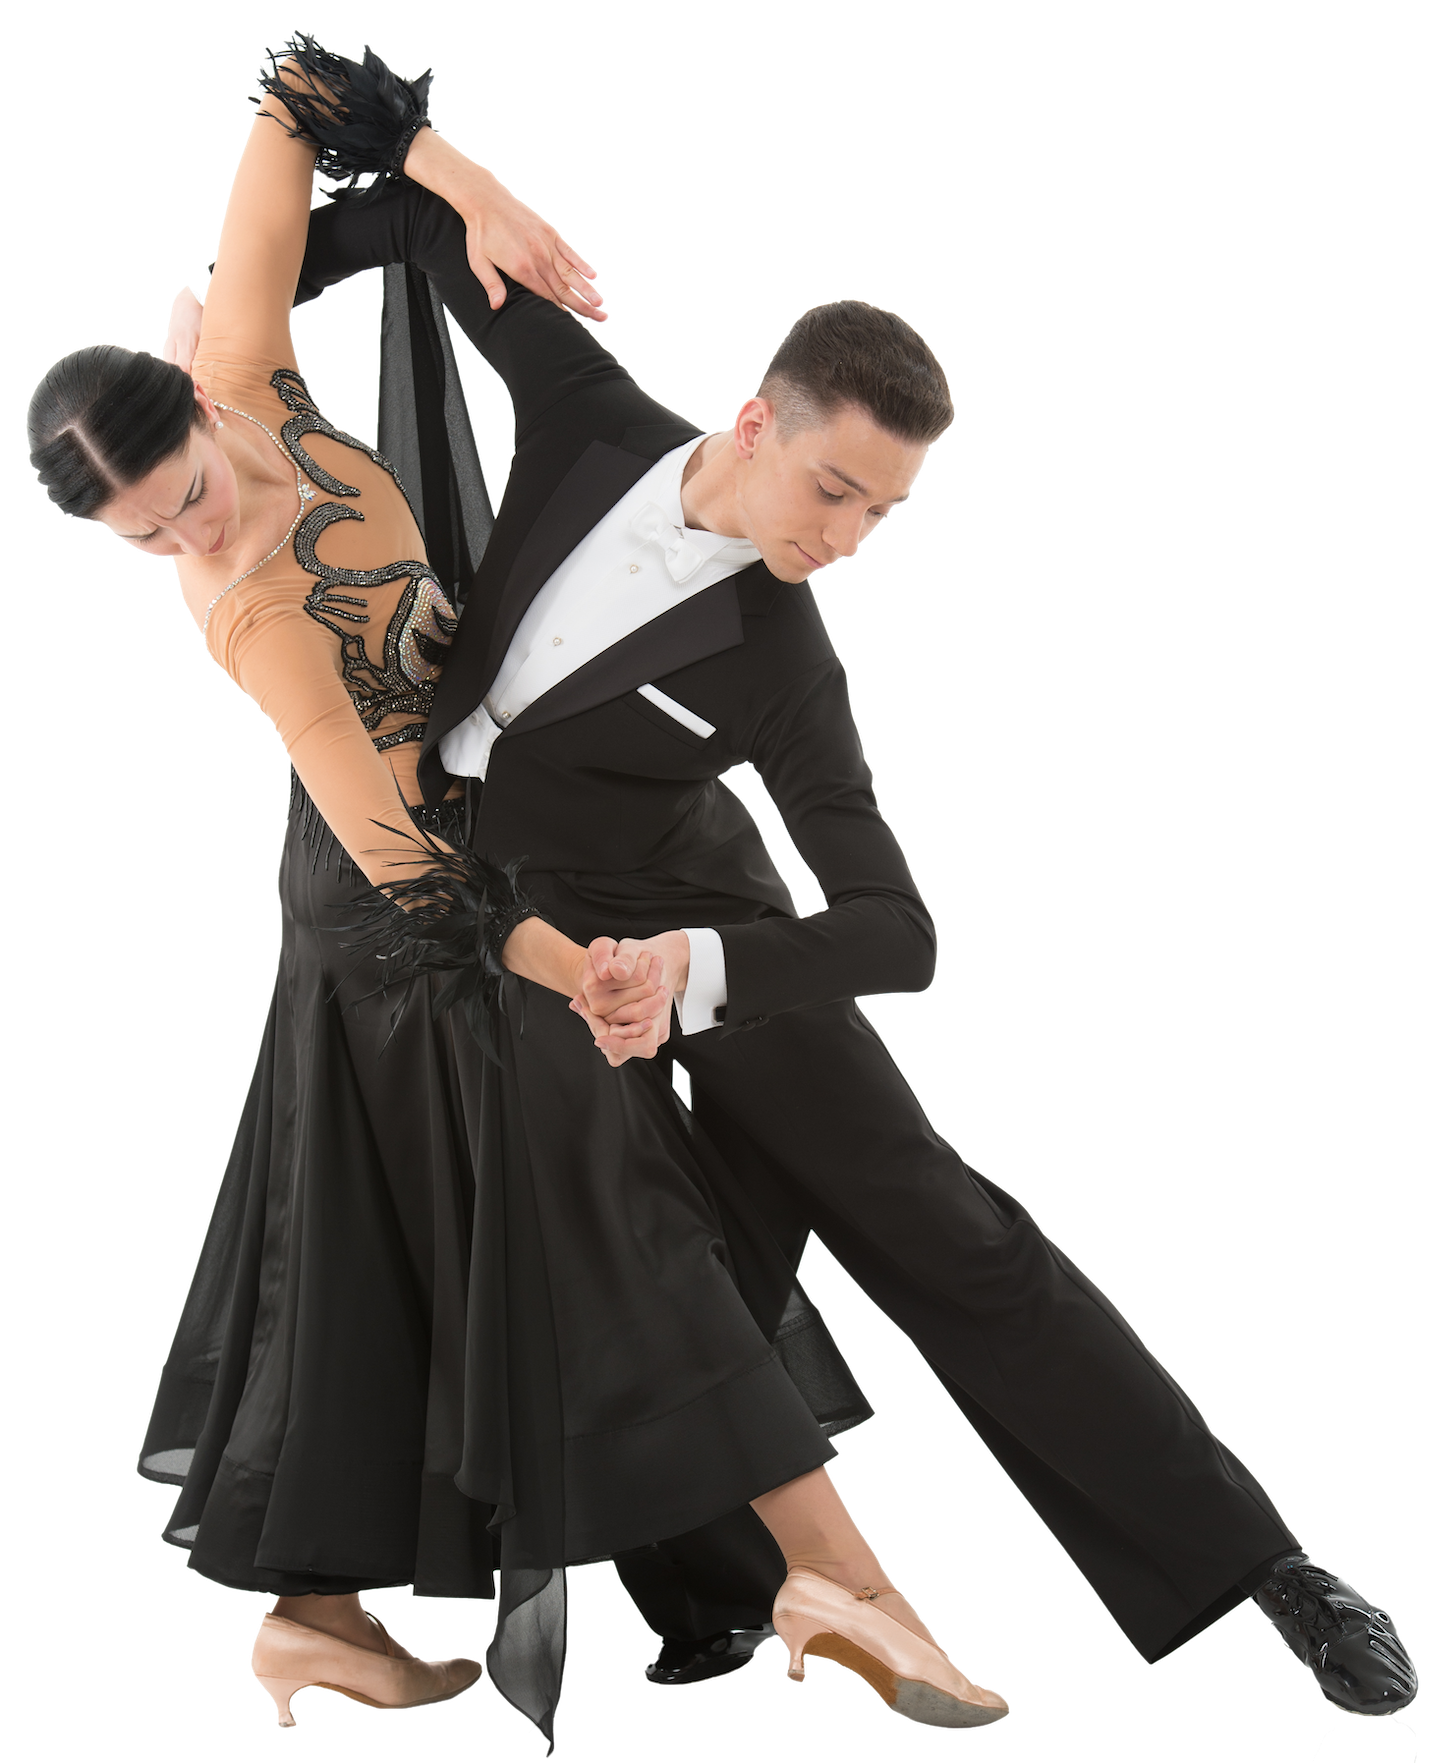 couple dancing ballroom in dance costumes